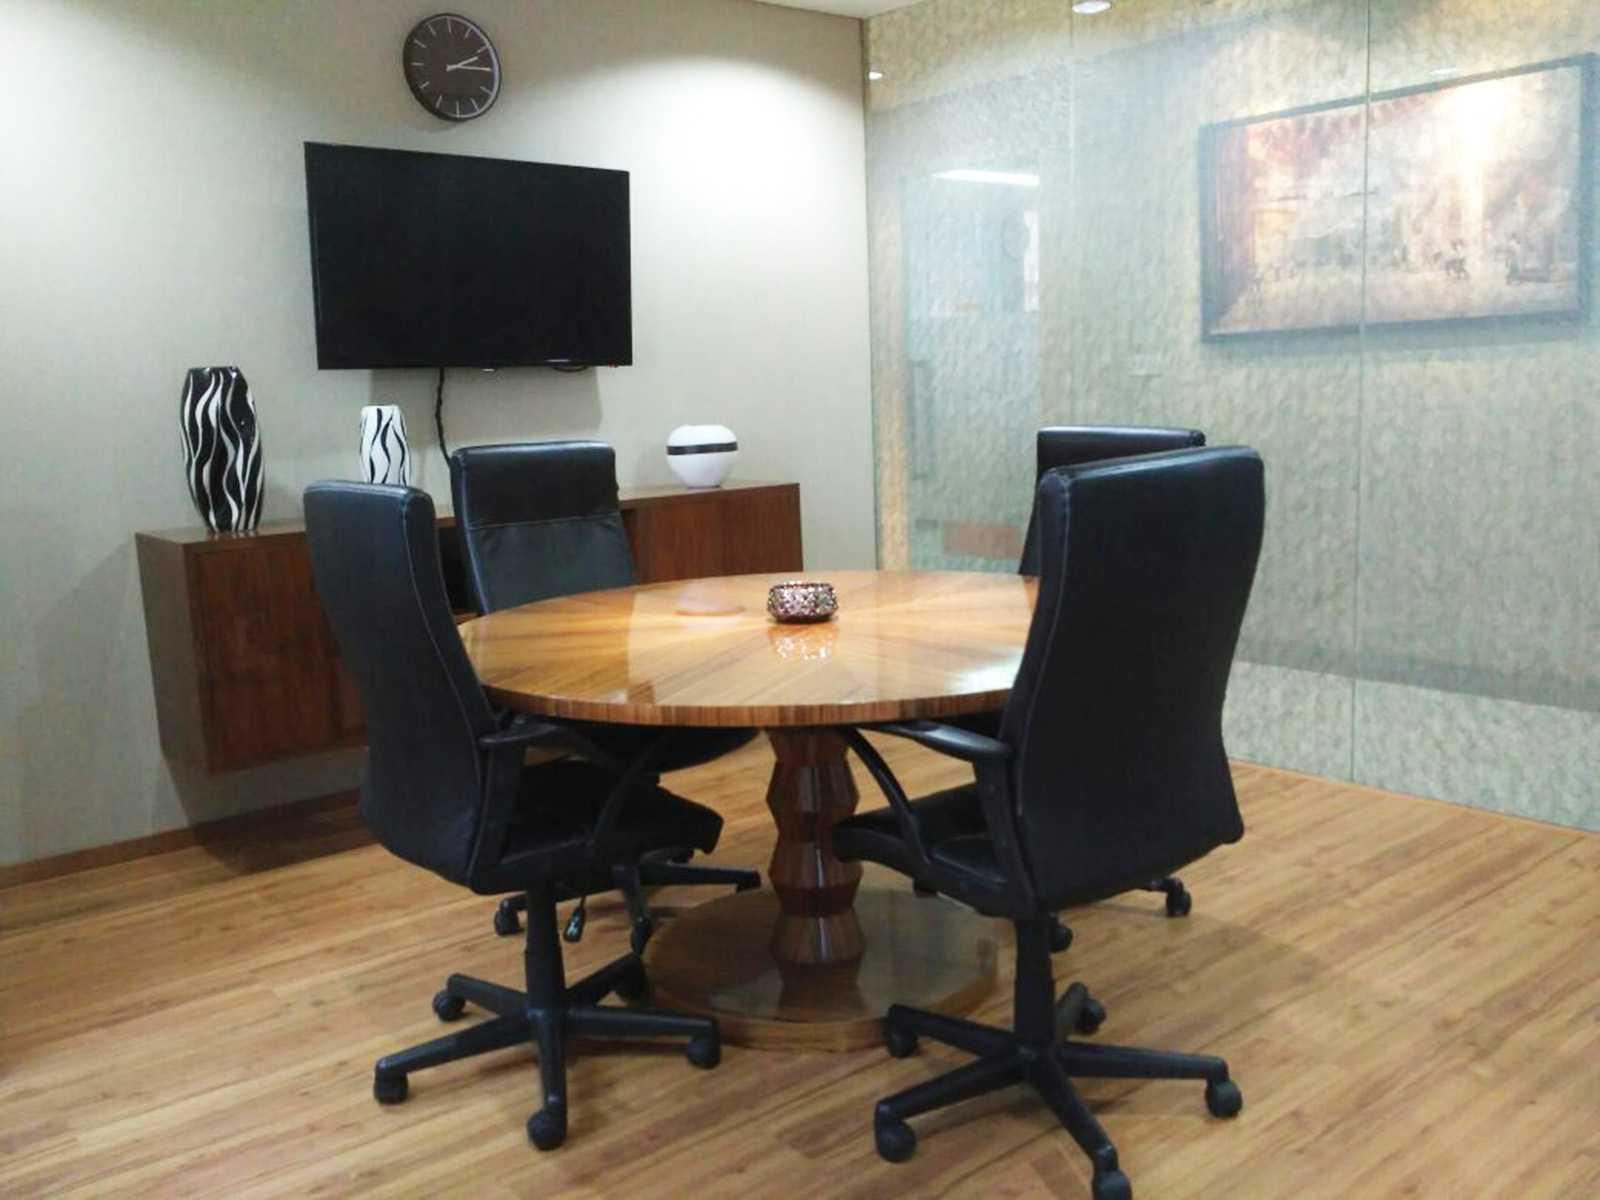 Ma Interior Design Sudirman Office Wisma Nugra Santana Wisma Nugra Santana Small Meeting Area Modern  10597